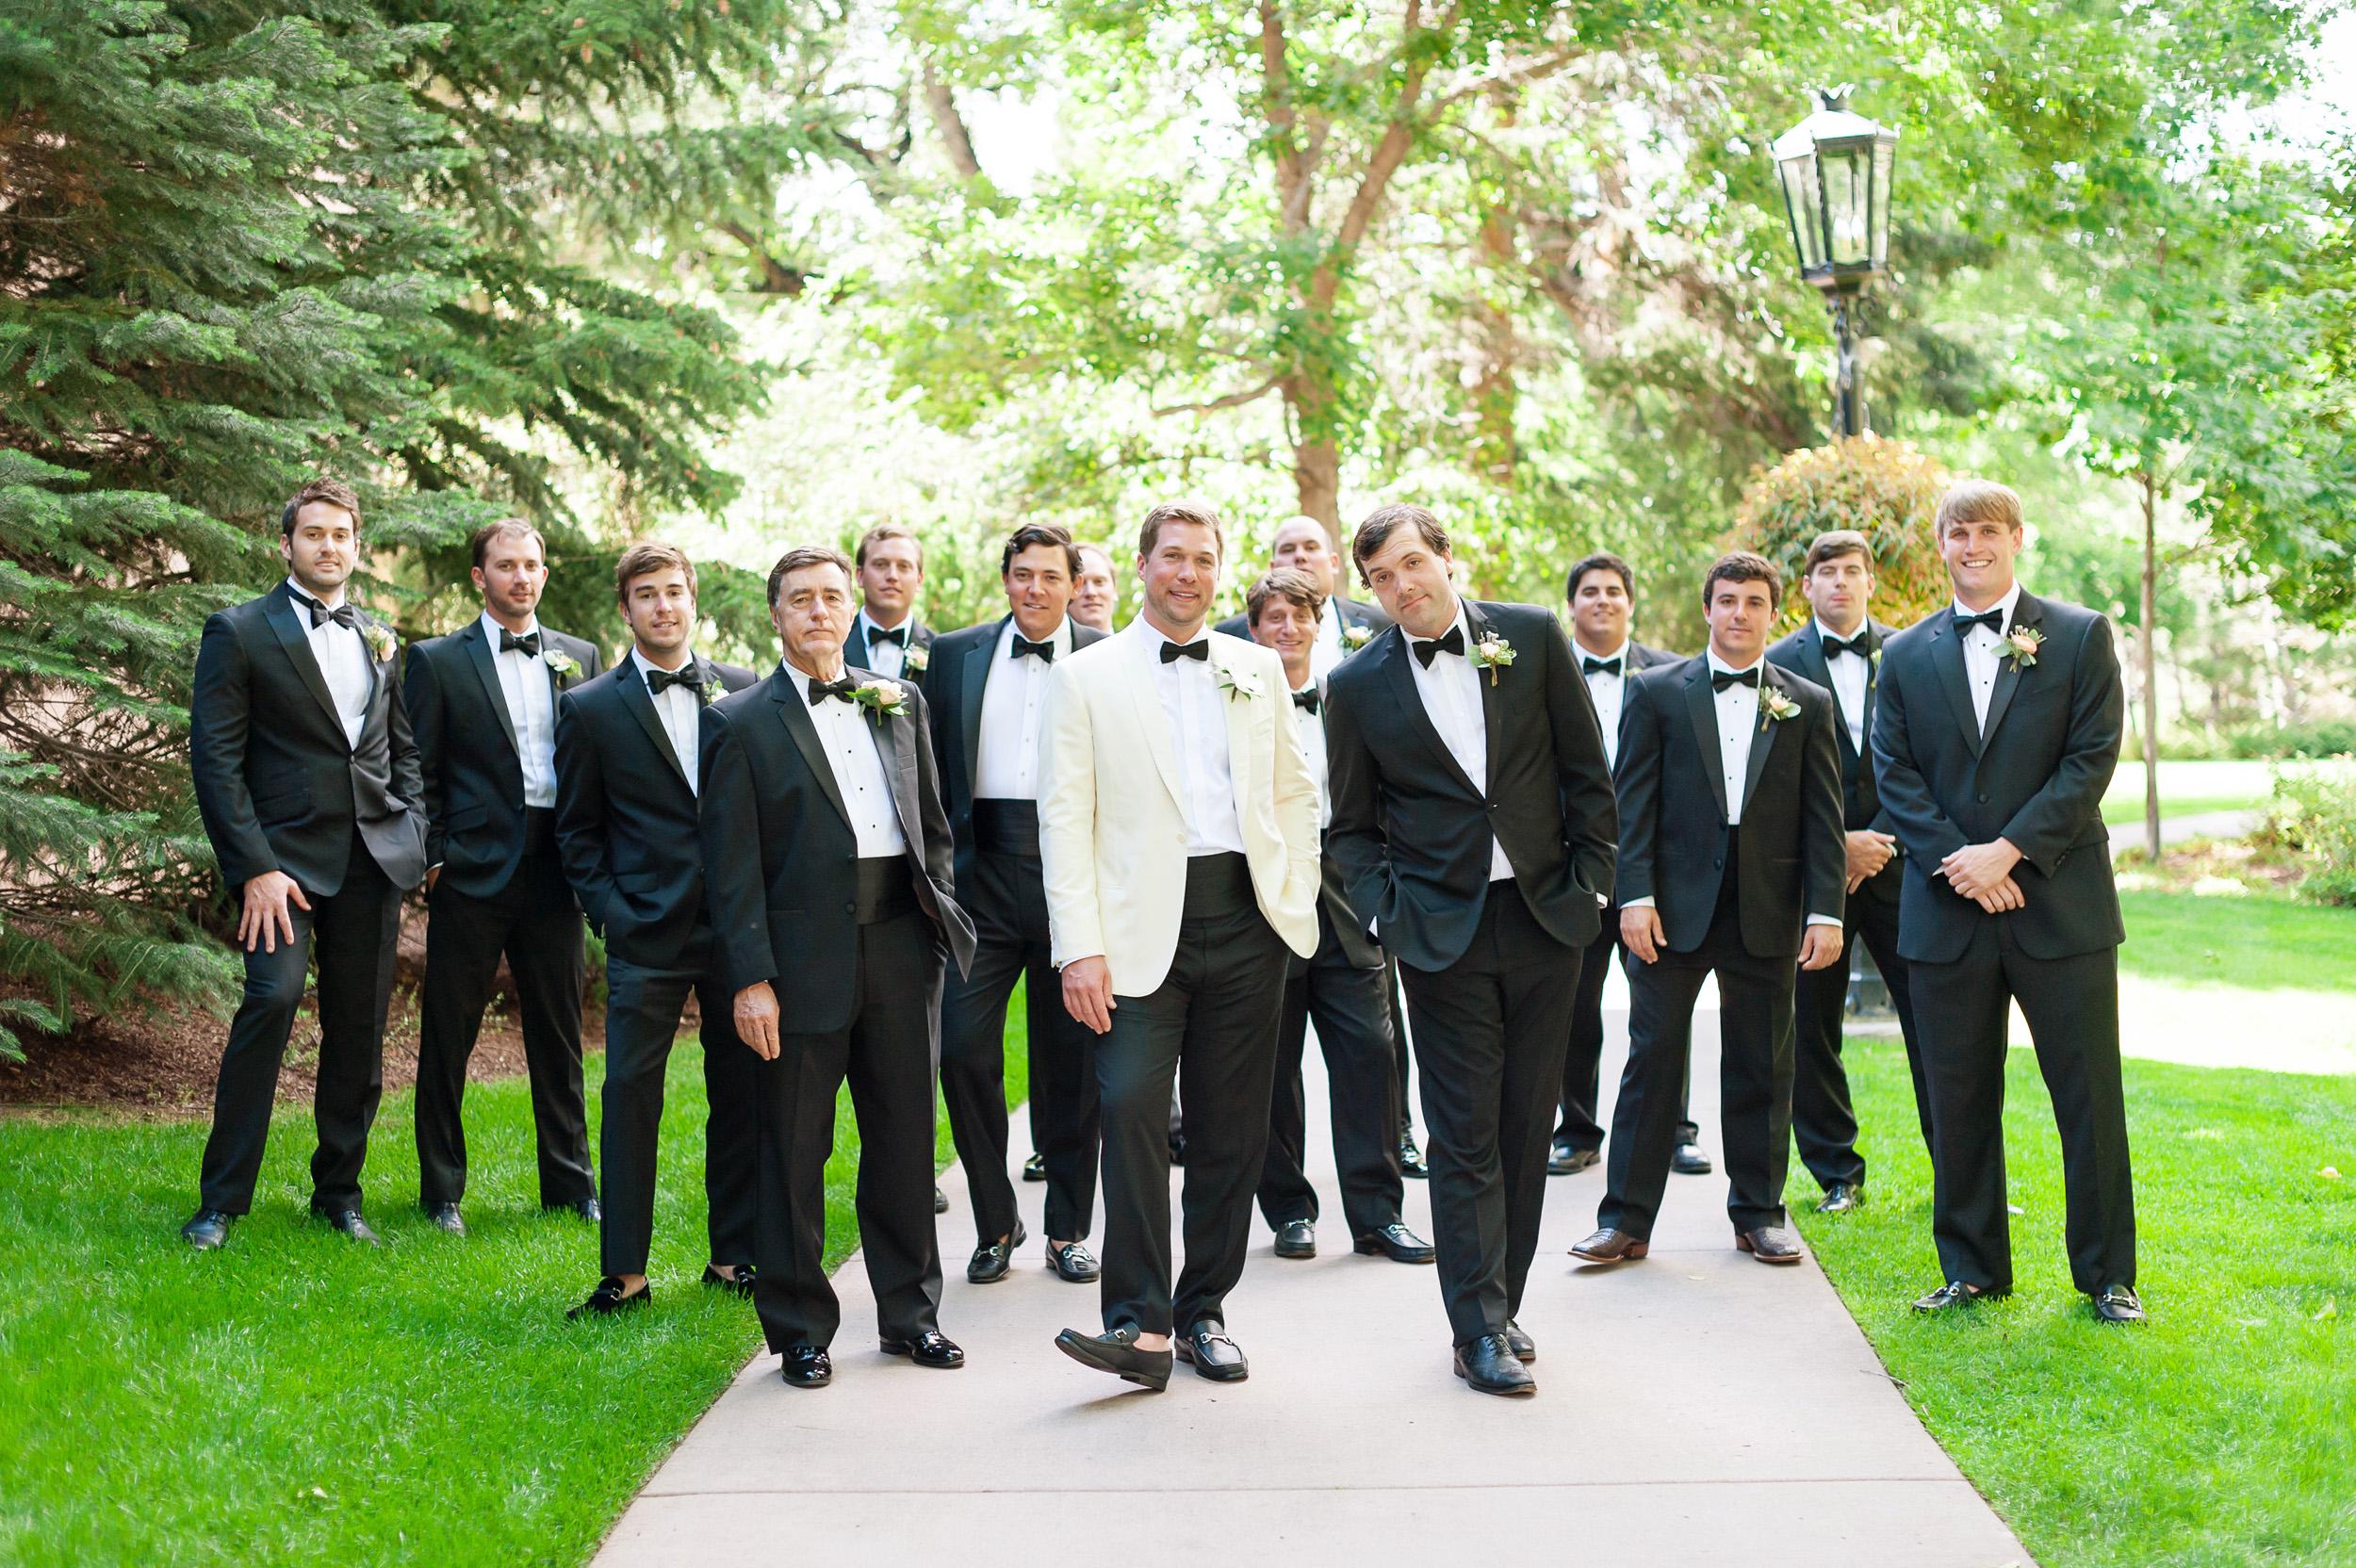 Broadmoor-Wedding-Photography-SS-006.jpg